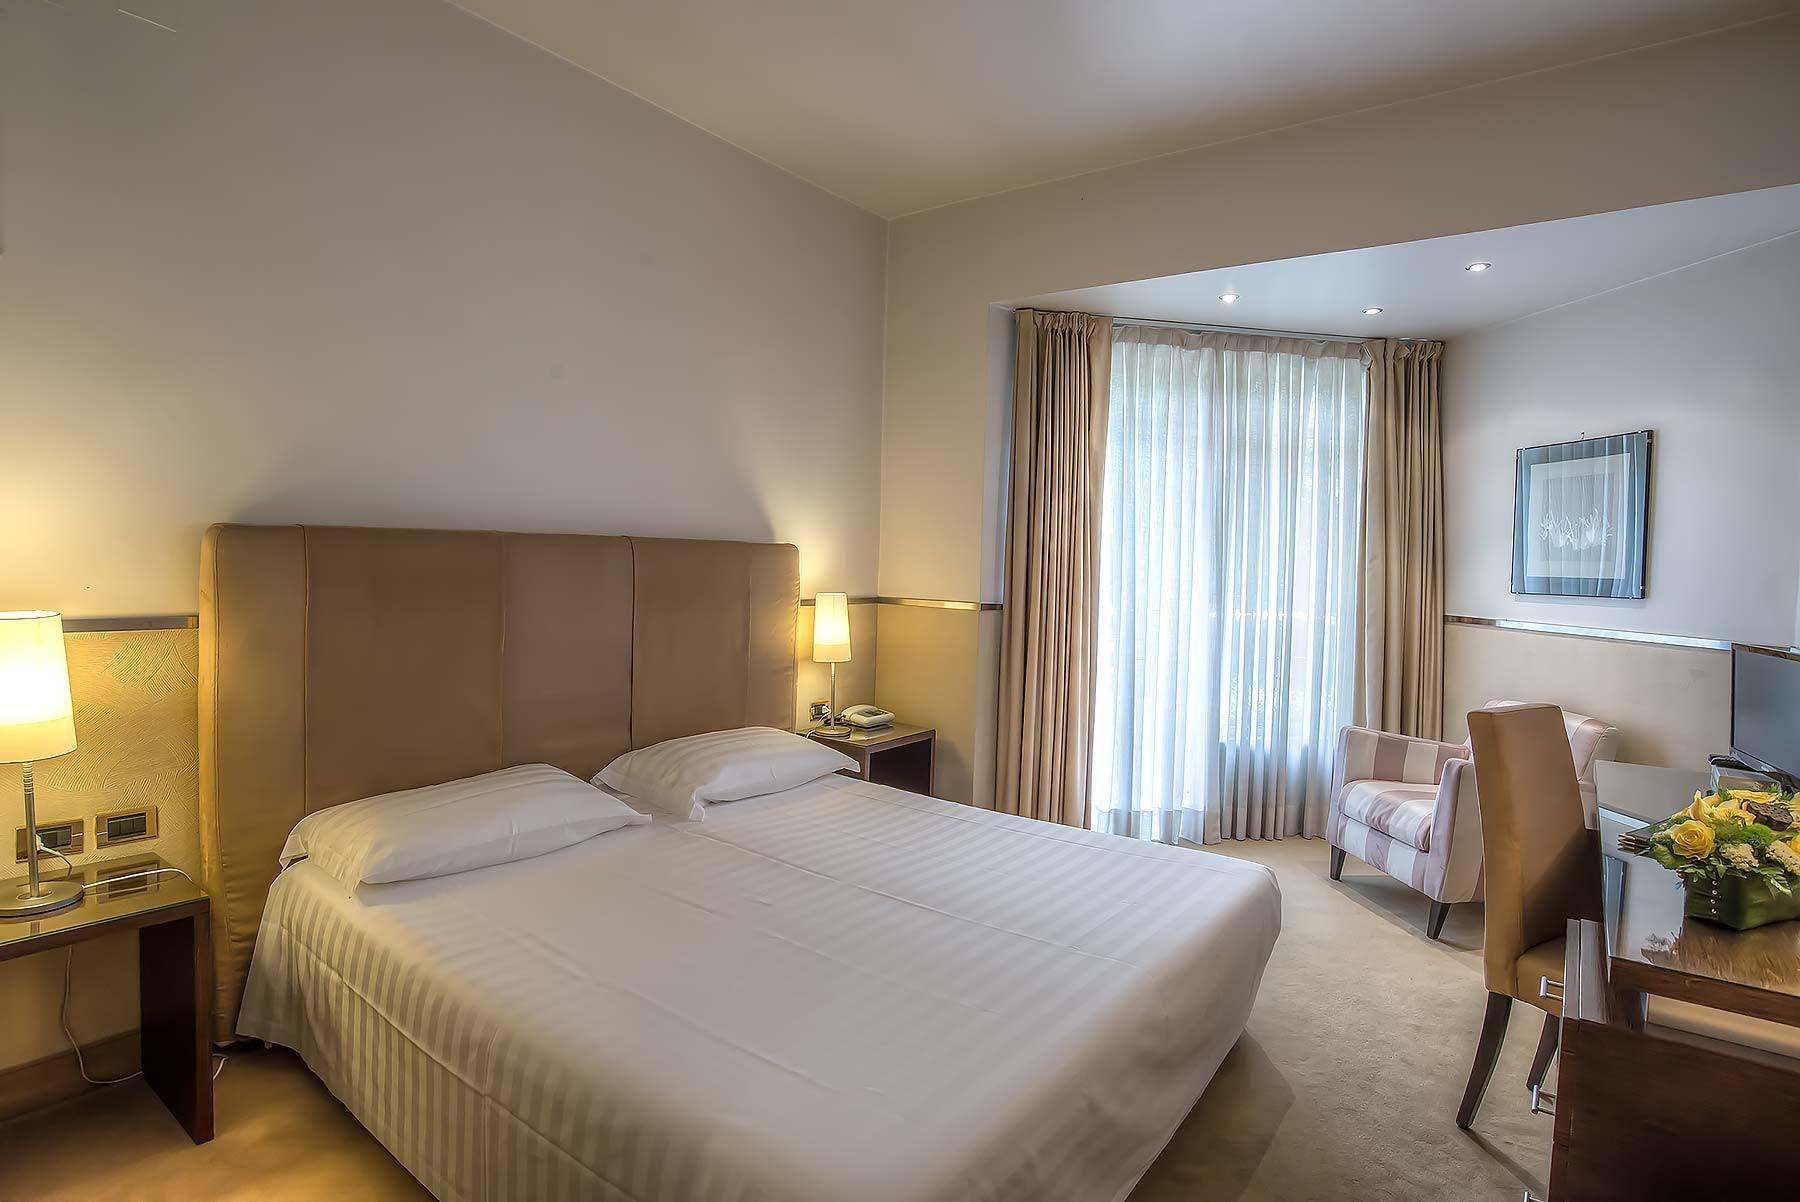 Mini Palace Hotel Viterbo Telefono